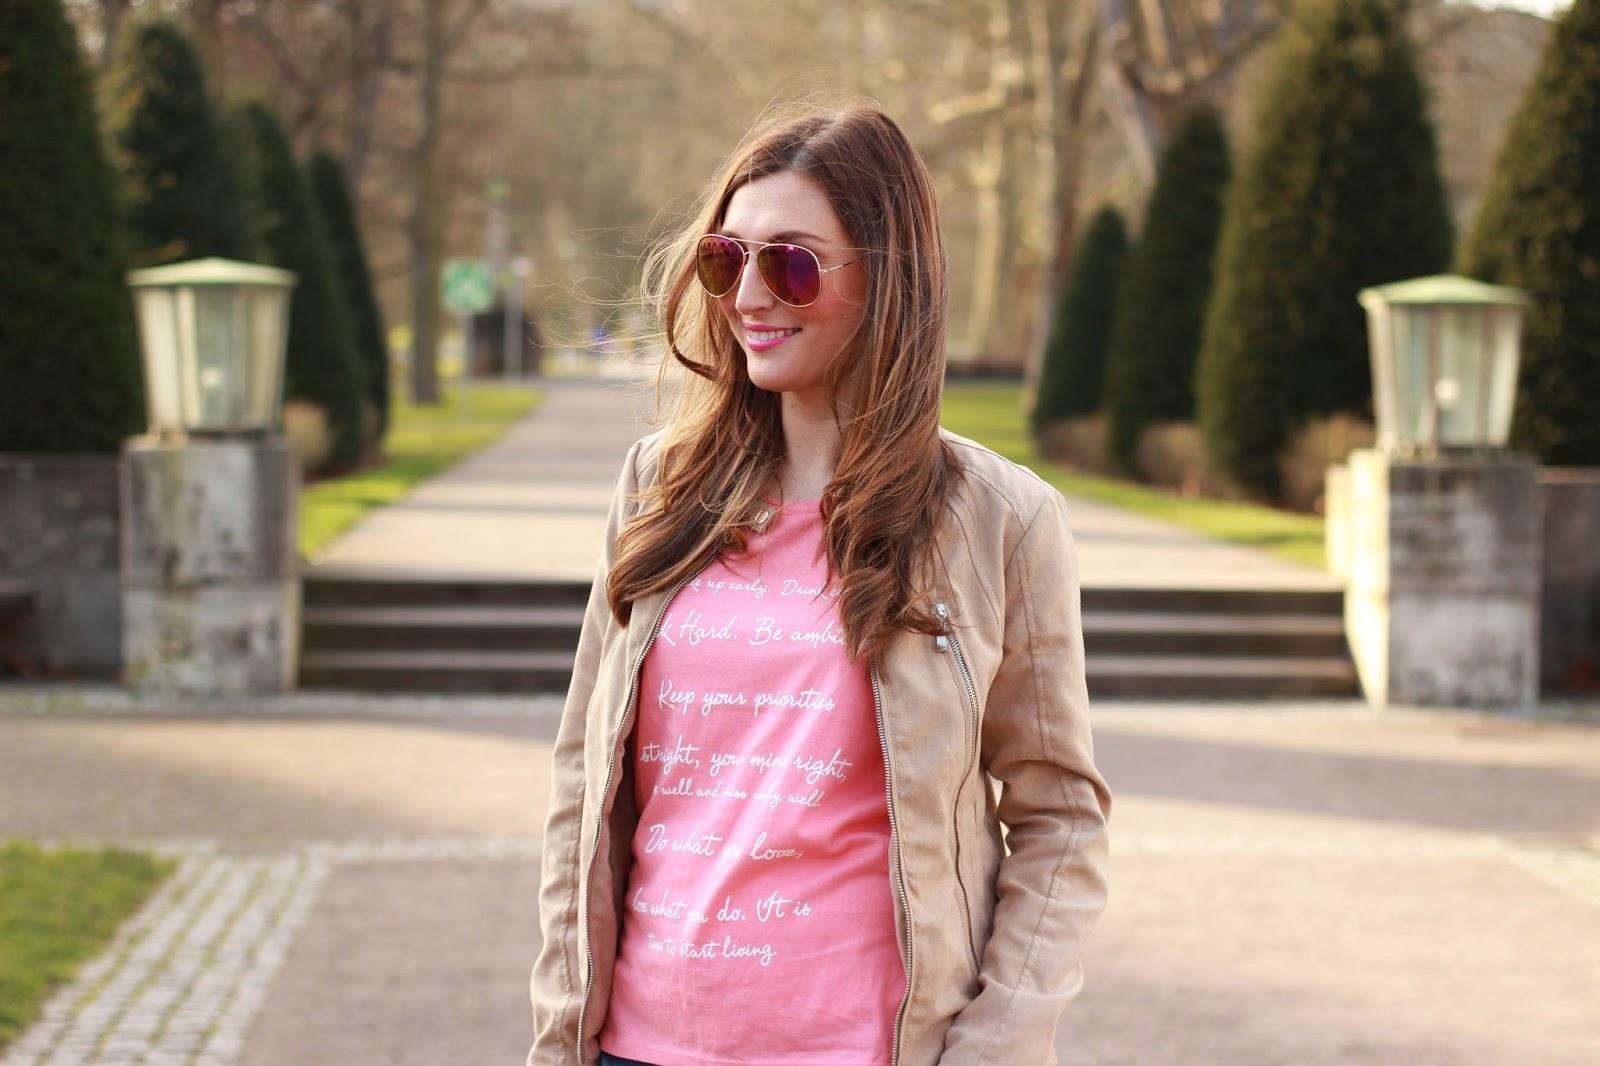 Rosa Tshirt - ripped jeans - beige lederjacke